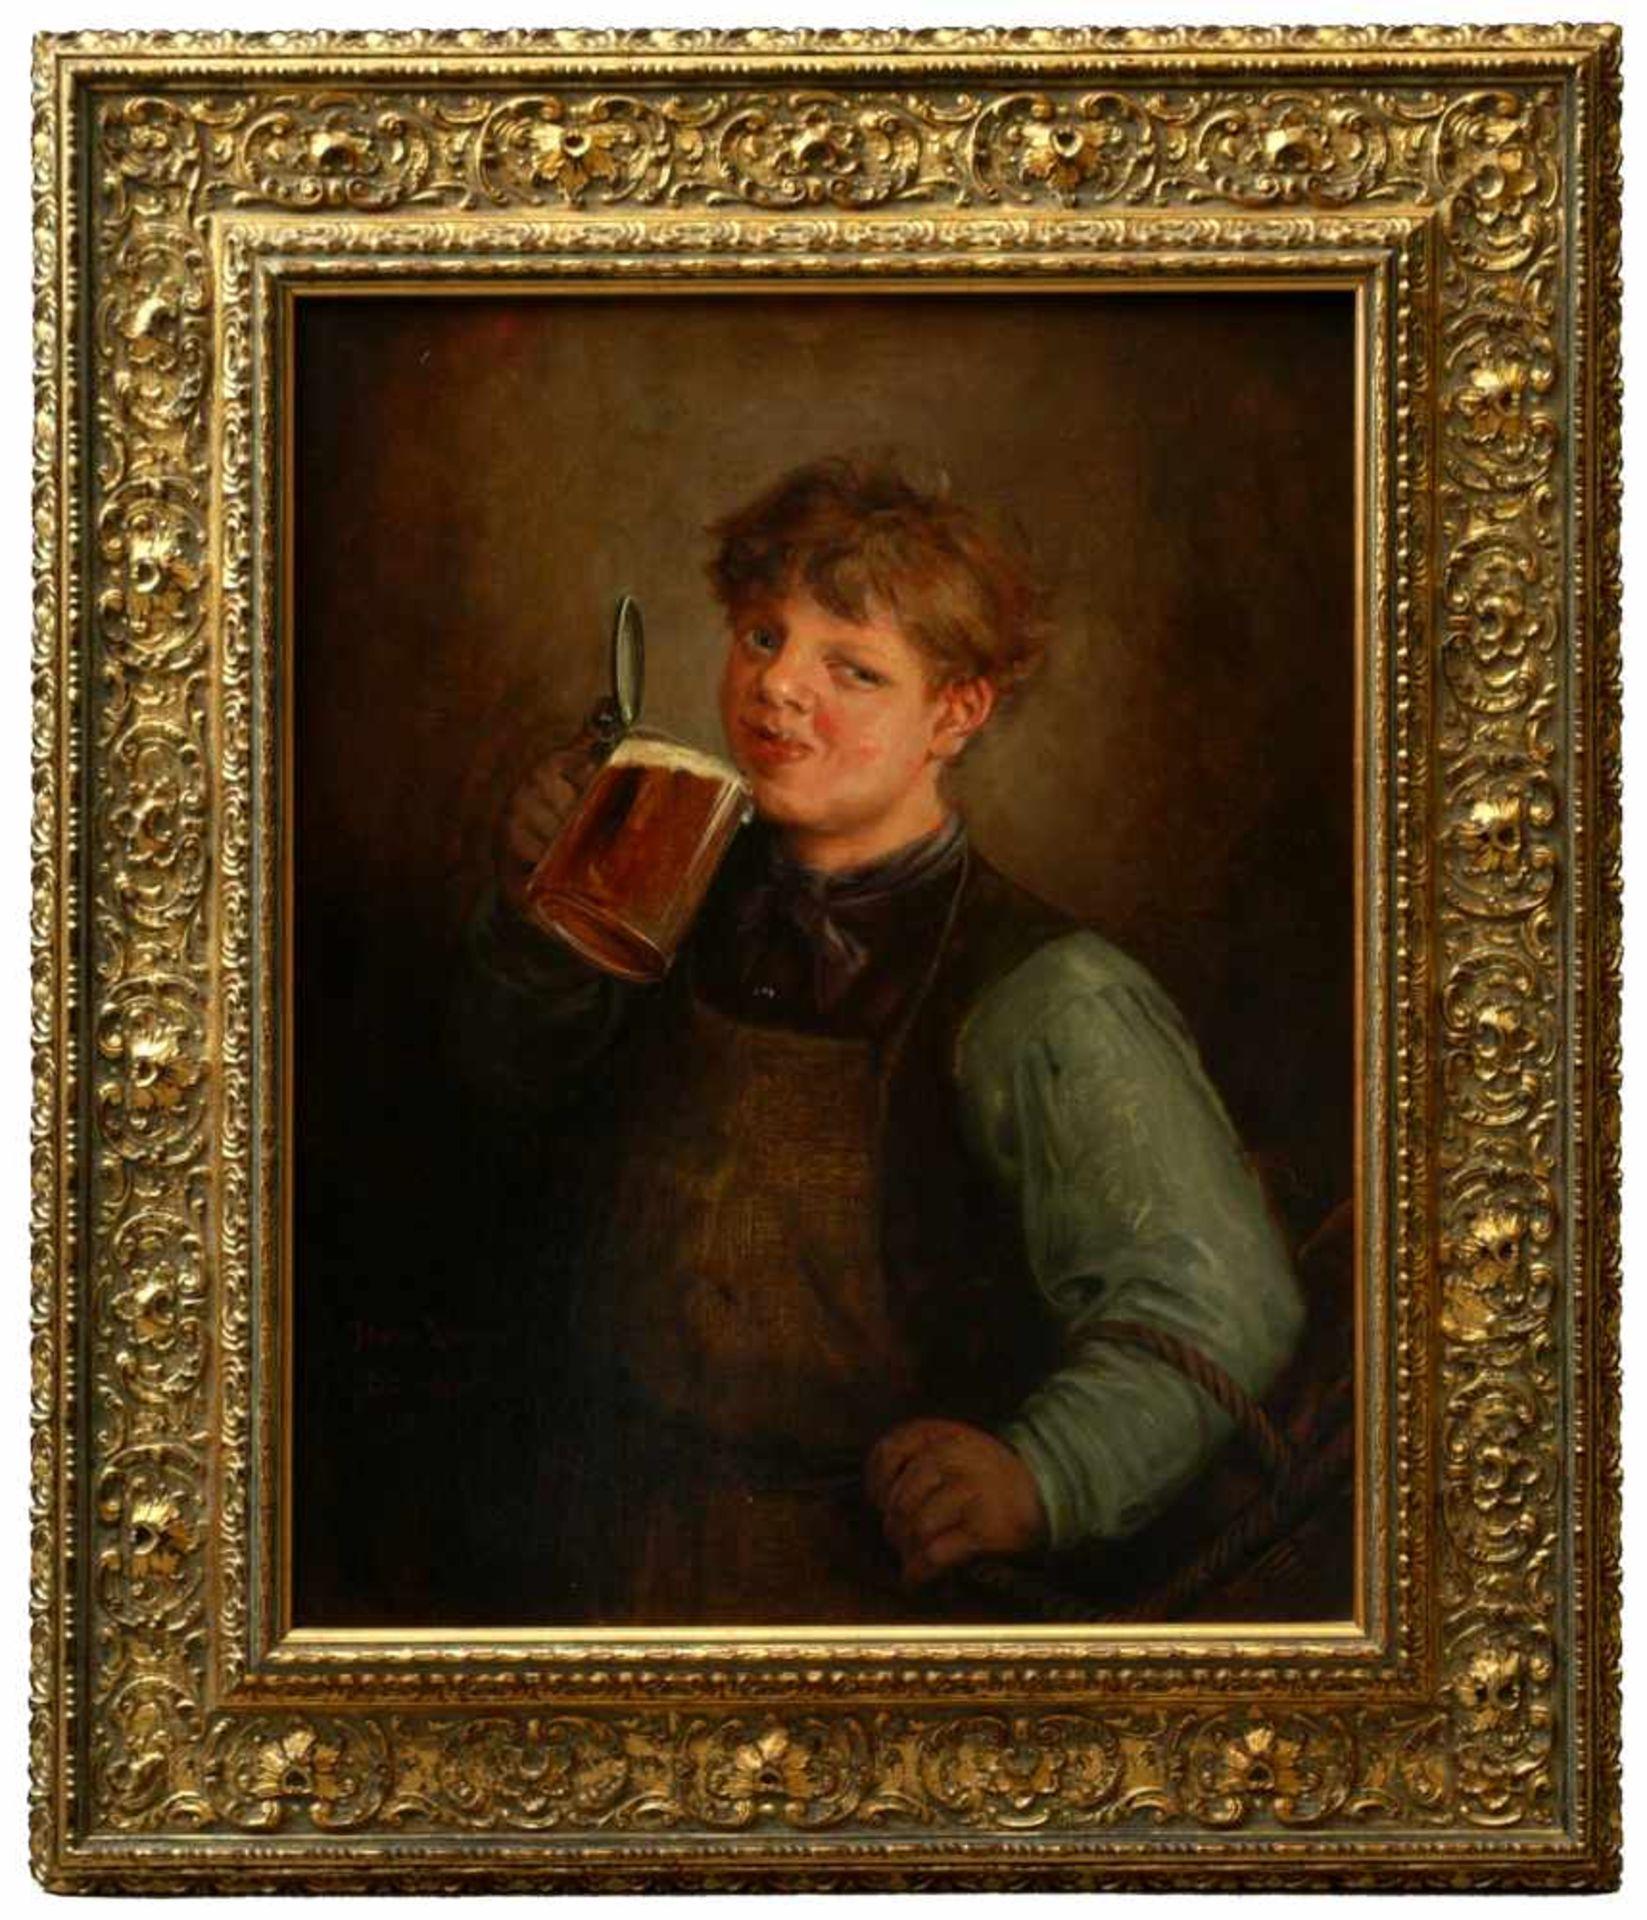 Lassen, Hans August (1857-1931) - Biertrinkender Jüngling Düsseldorf 1890Großformatiges Hüftstück,